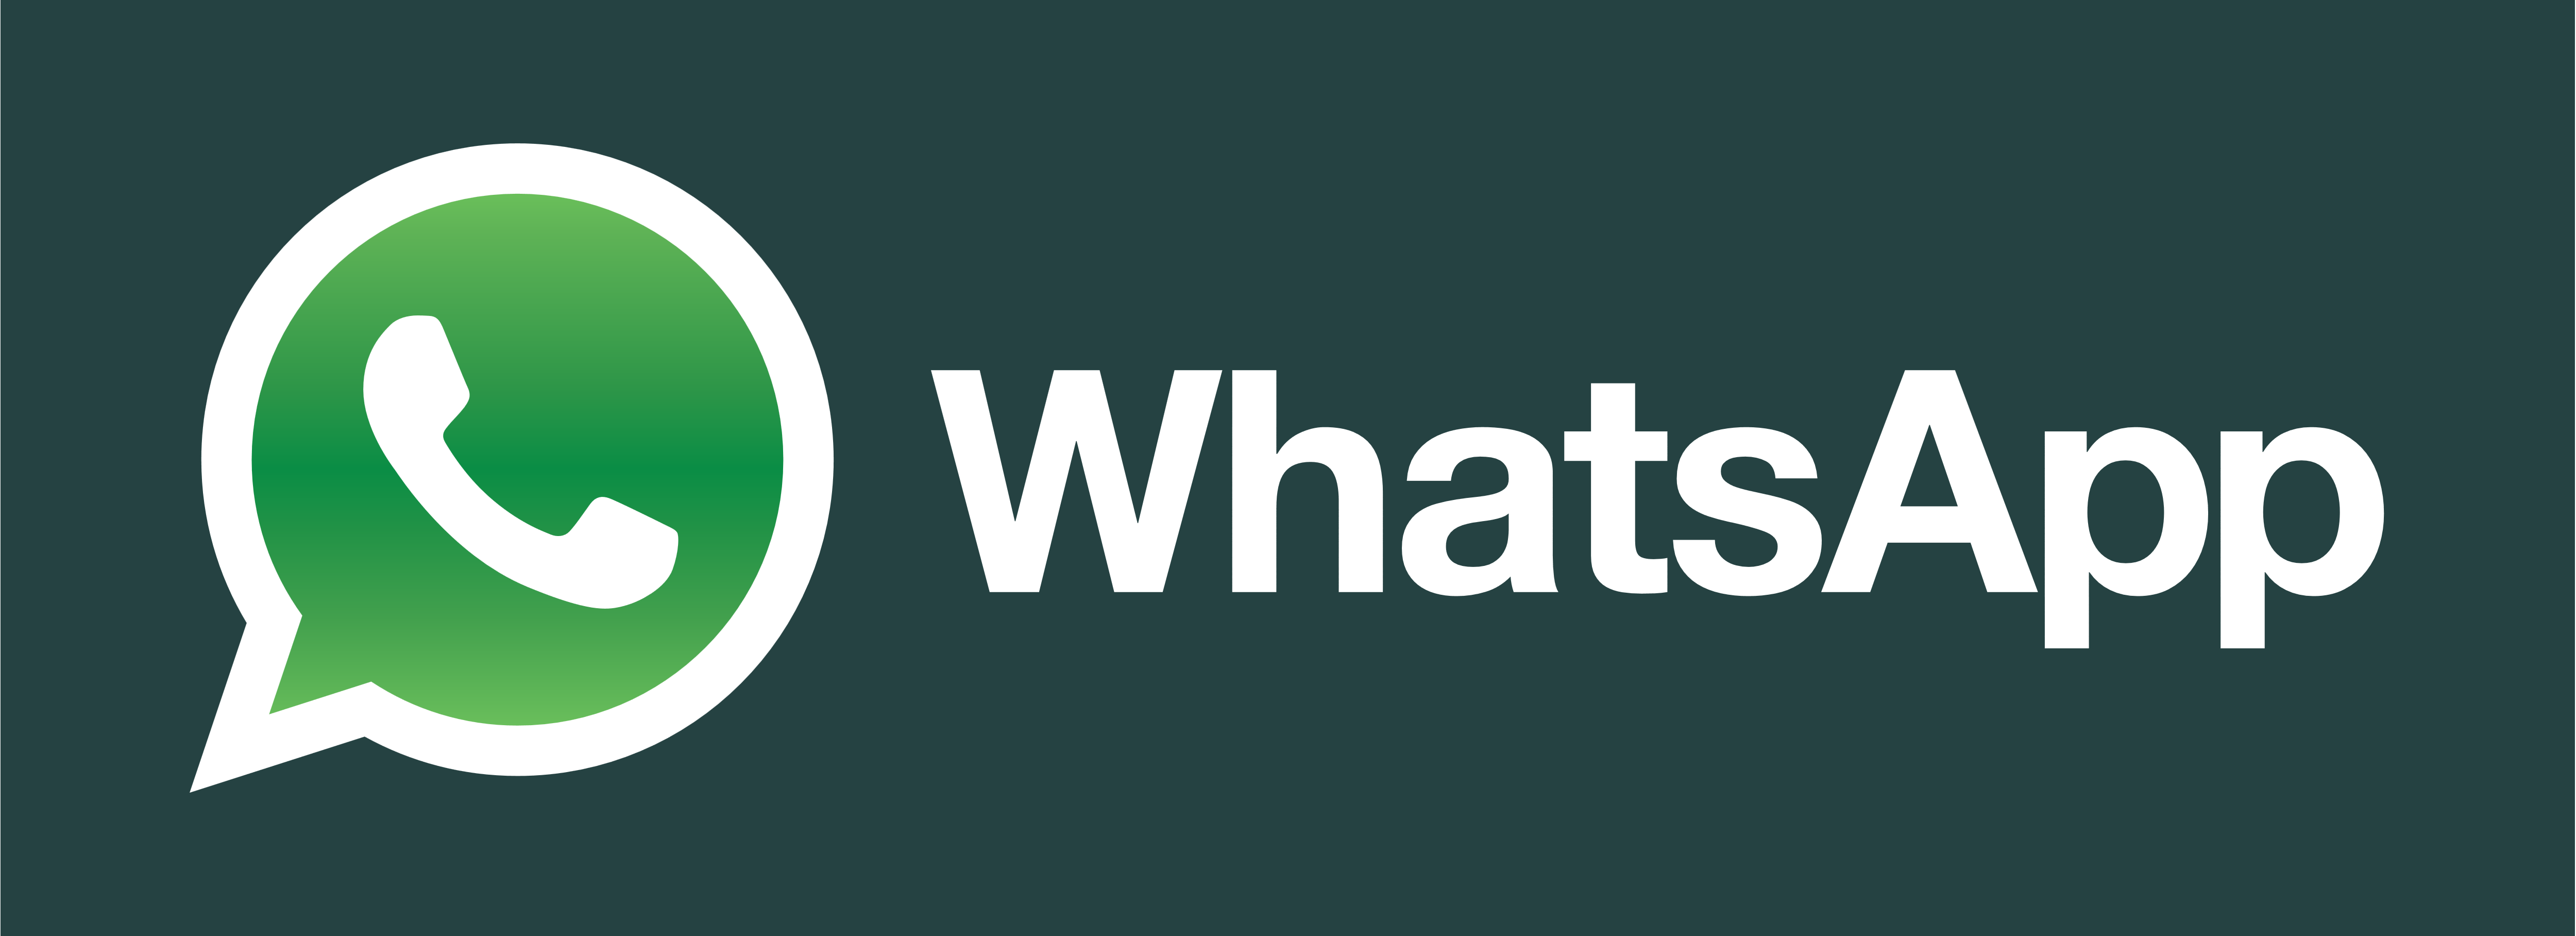 WhatsApp - Logos Download